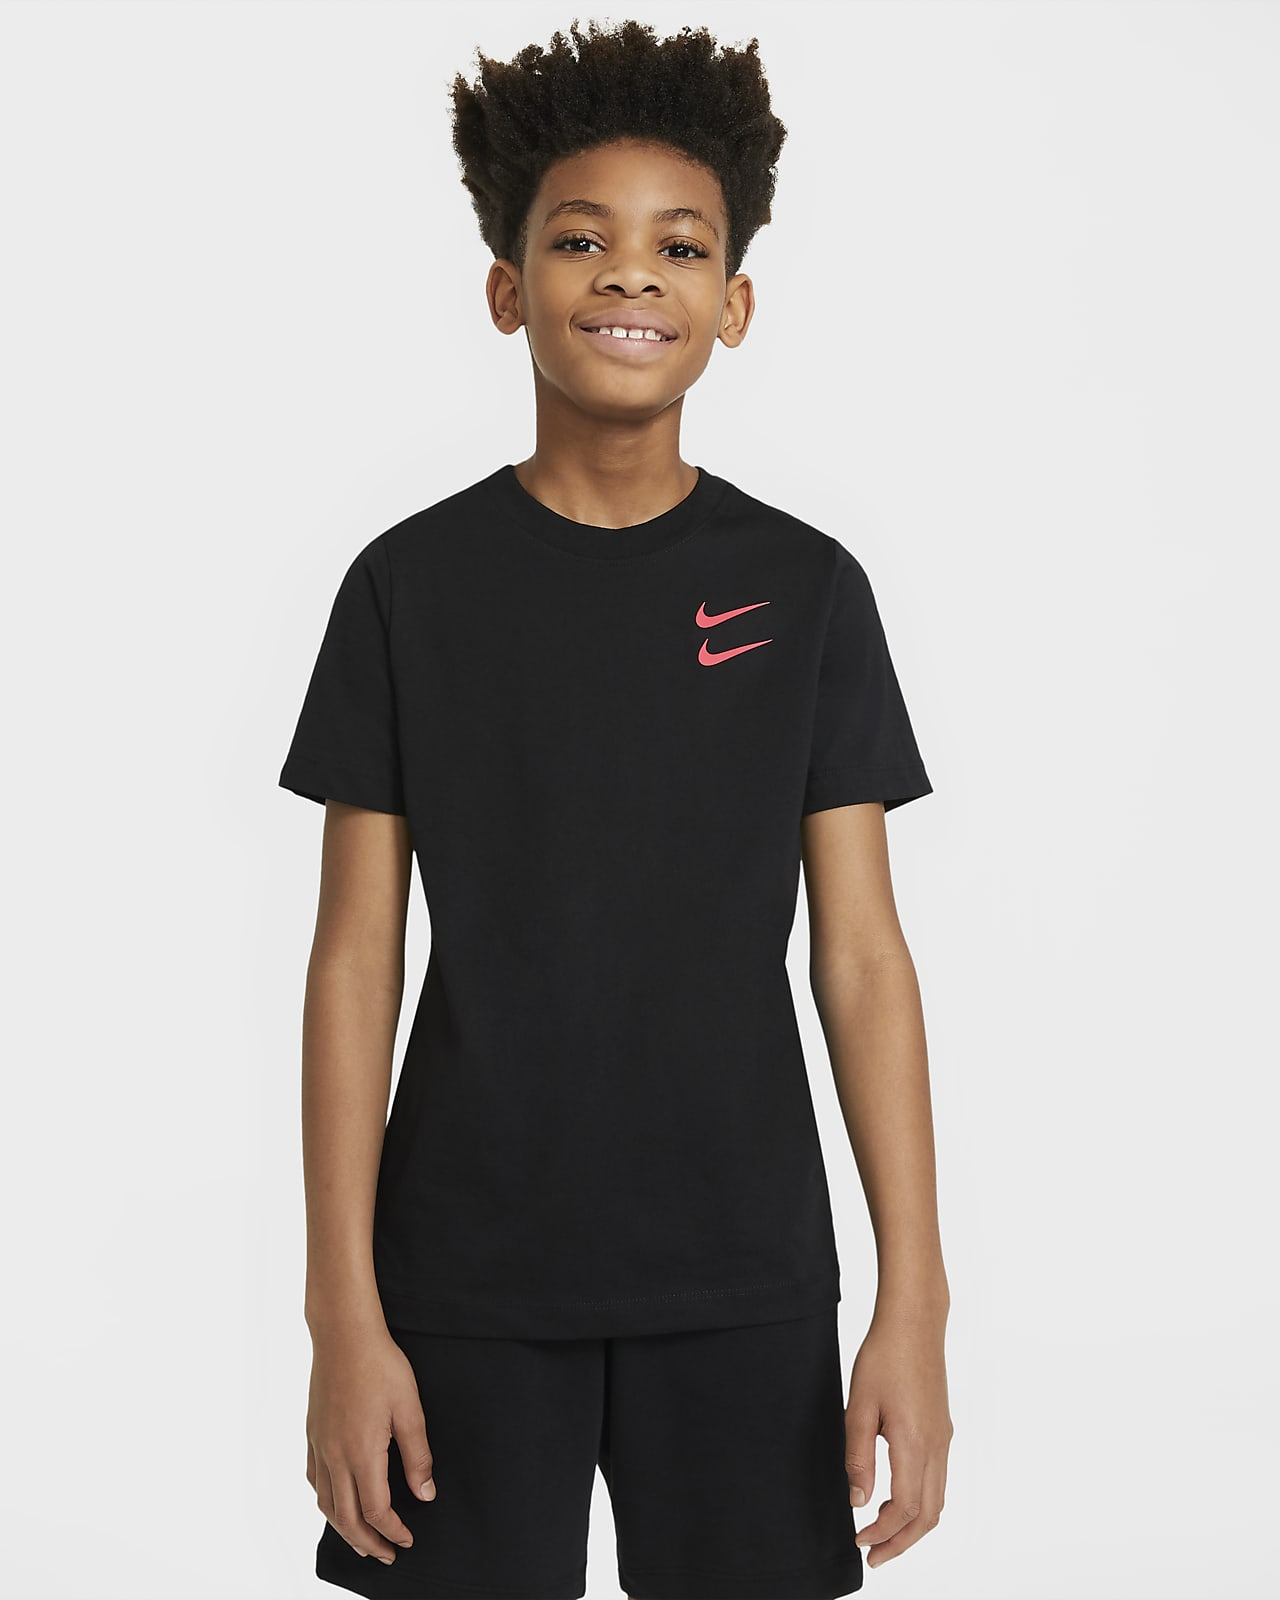 Nike Sportswear T skjorte til store barn (gutt). Nike NO